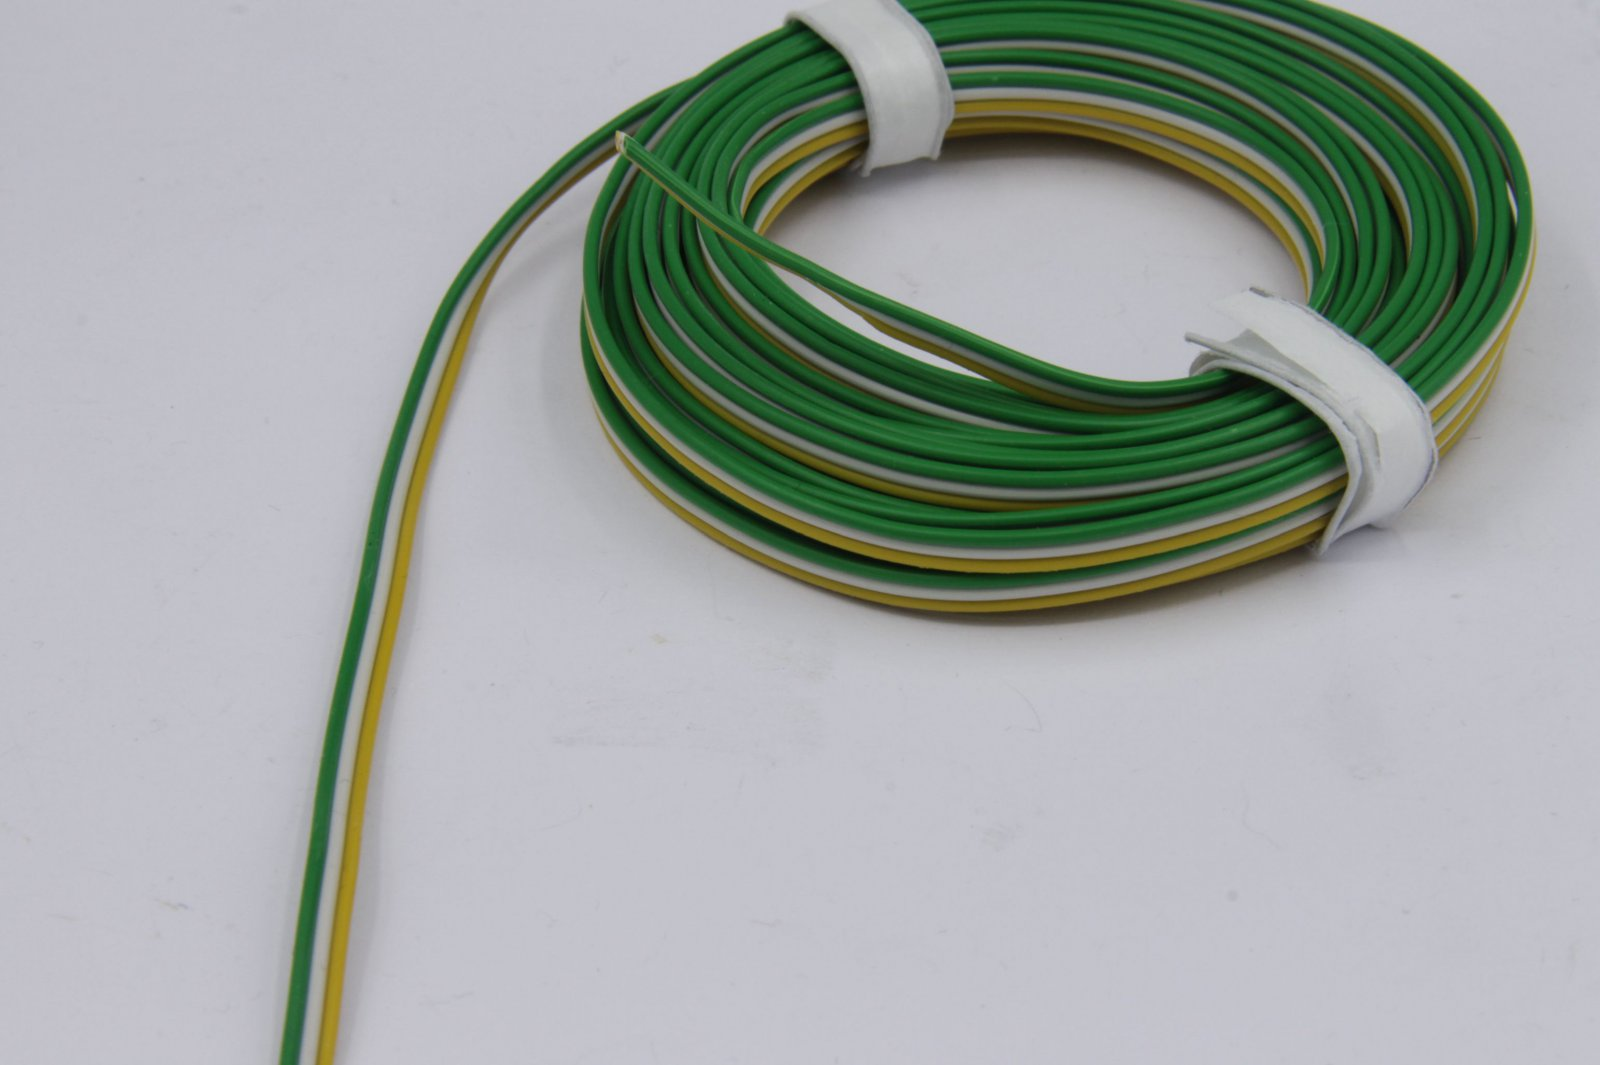 5m Drillingslitze 3 x 0,14mm² für Trix gelb/weiß/grün